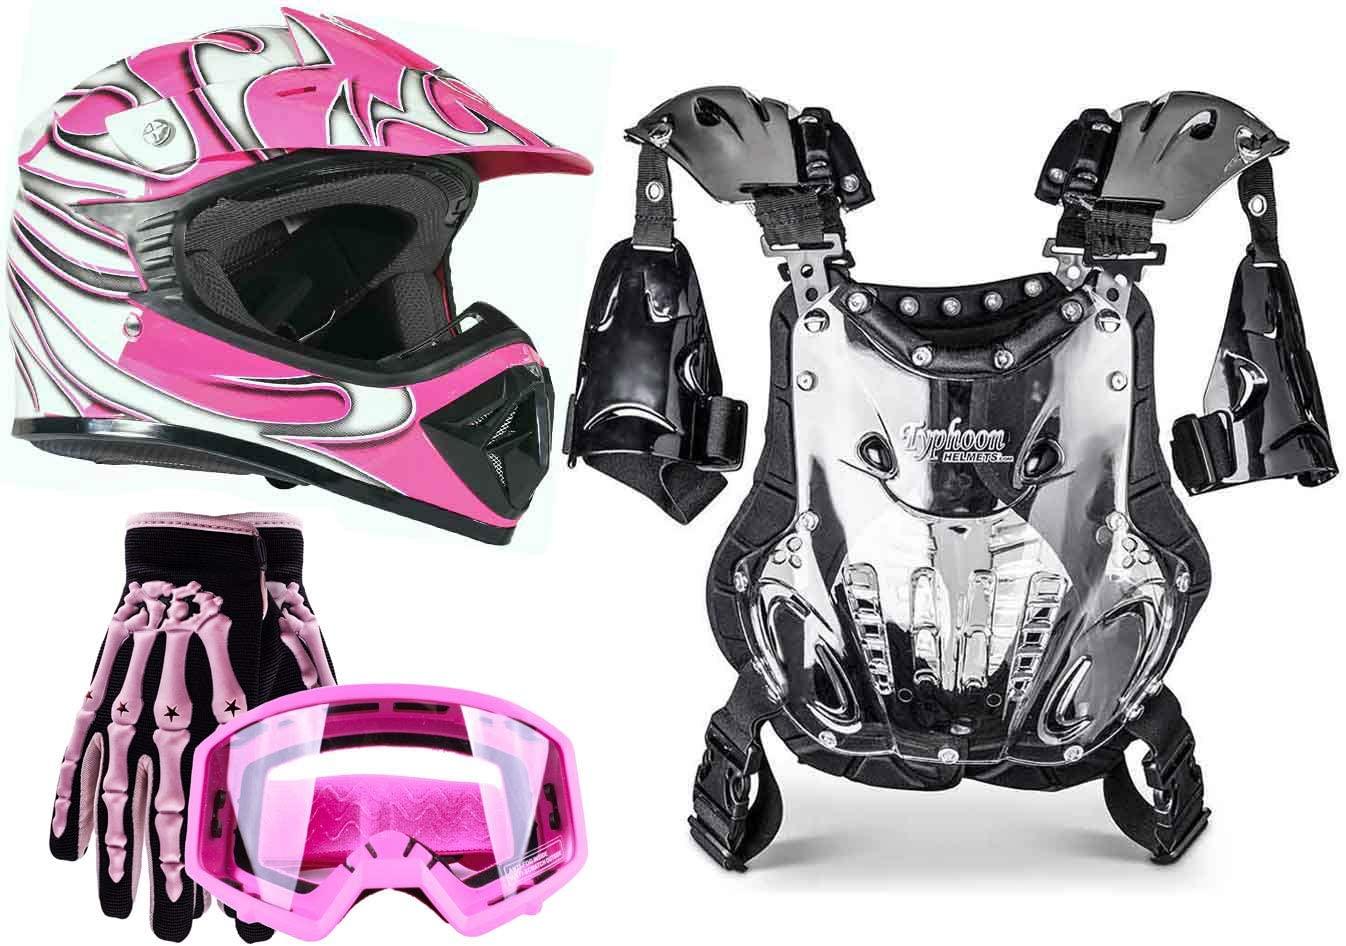 Typhoon Youth Girl's Motocross Helmet Gloves Goggles Chest Protector Combo ATV Dirt Bike MX - Pink (Medium)